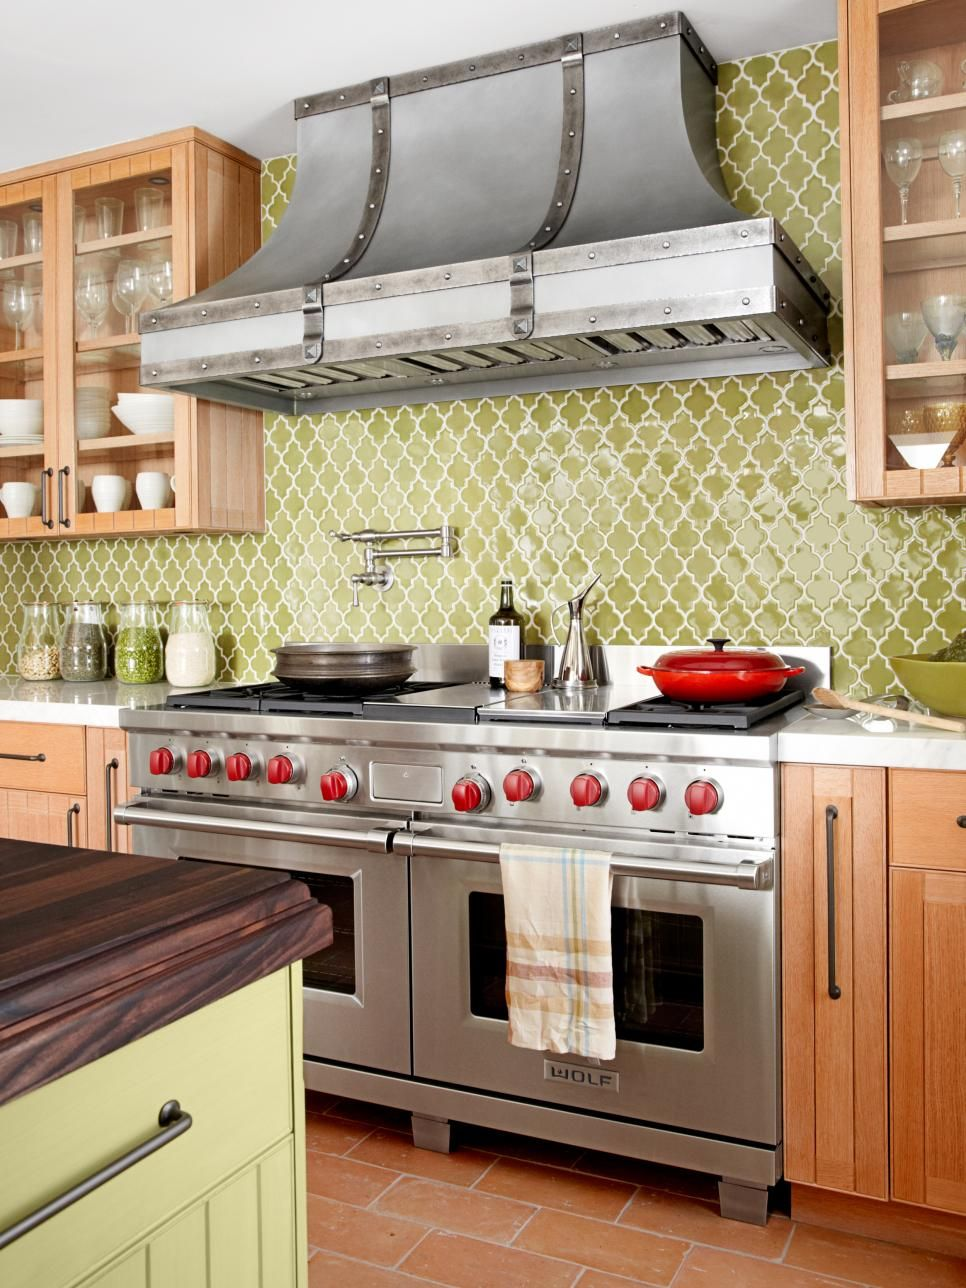 Dreamy kitchen backsplashes kitchen remodel pinterest kitchen